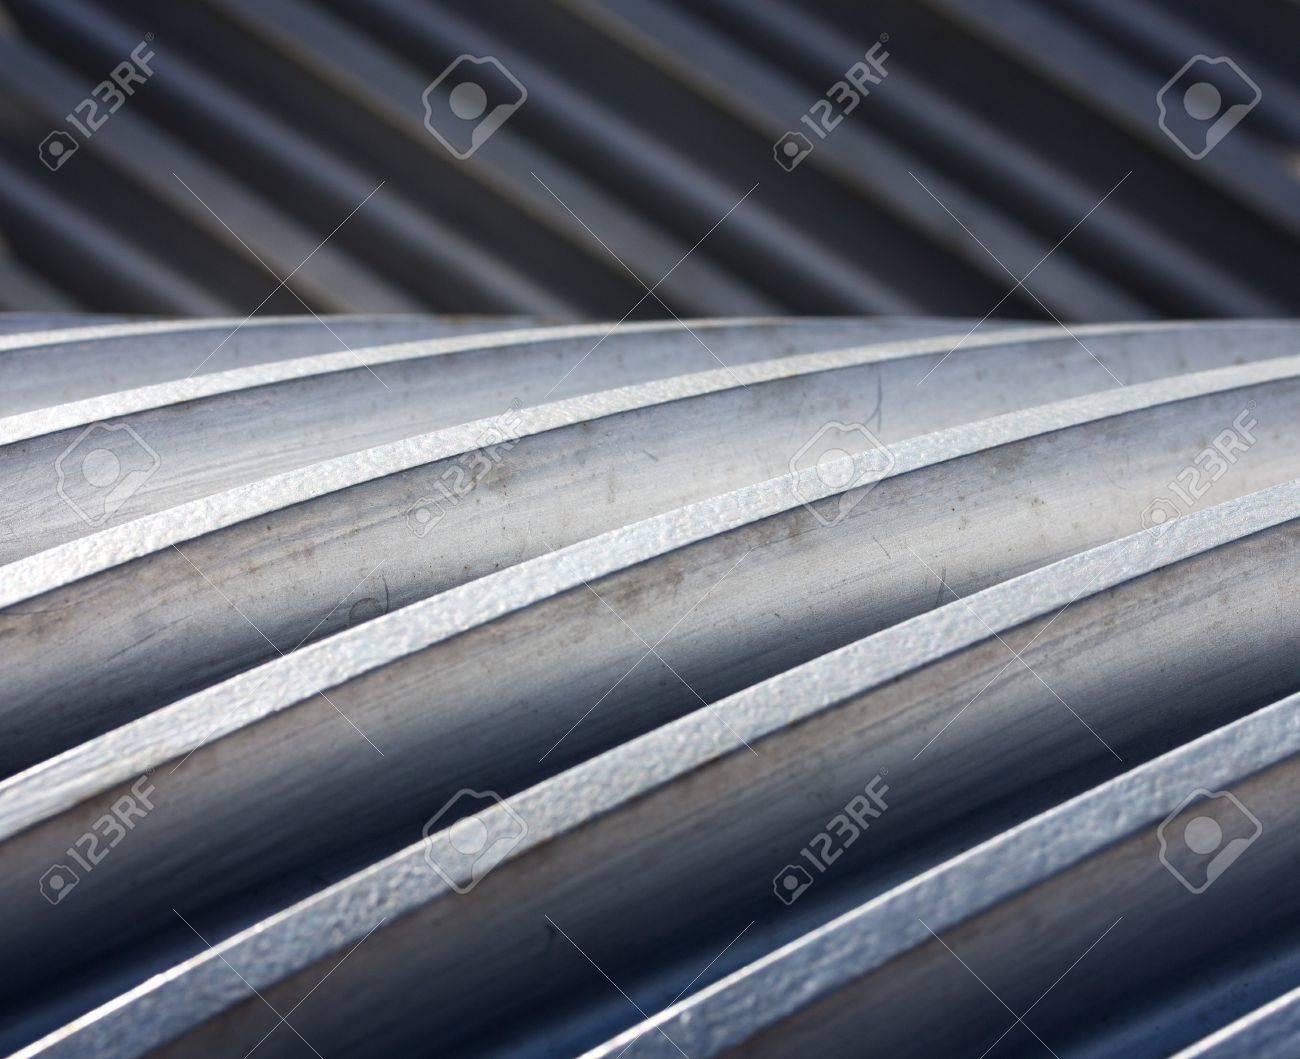 A Thread of gear close up - 21276003